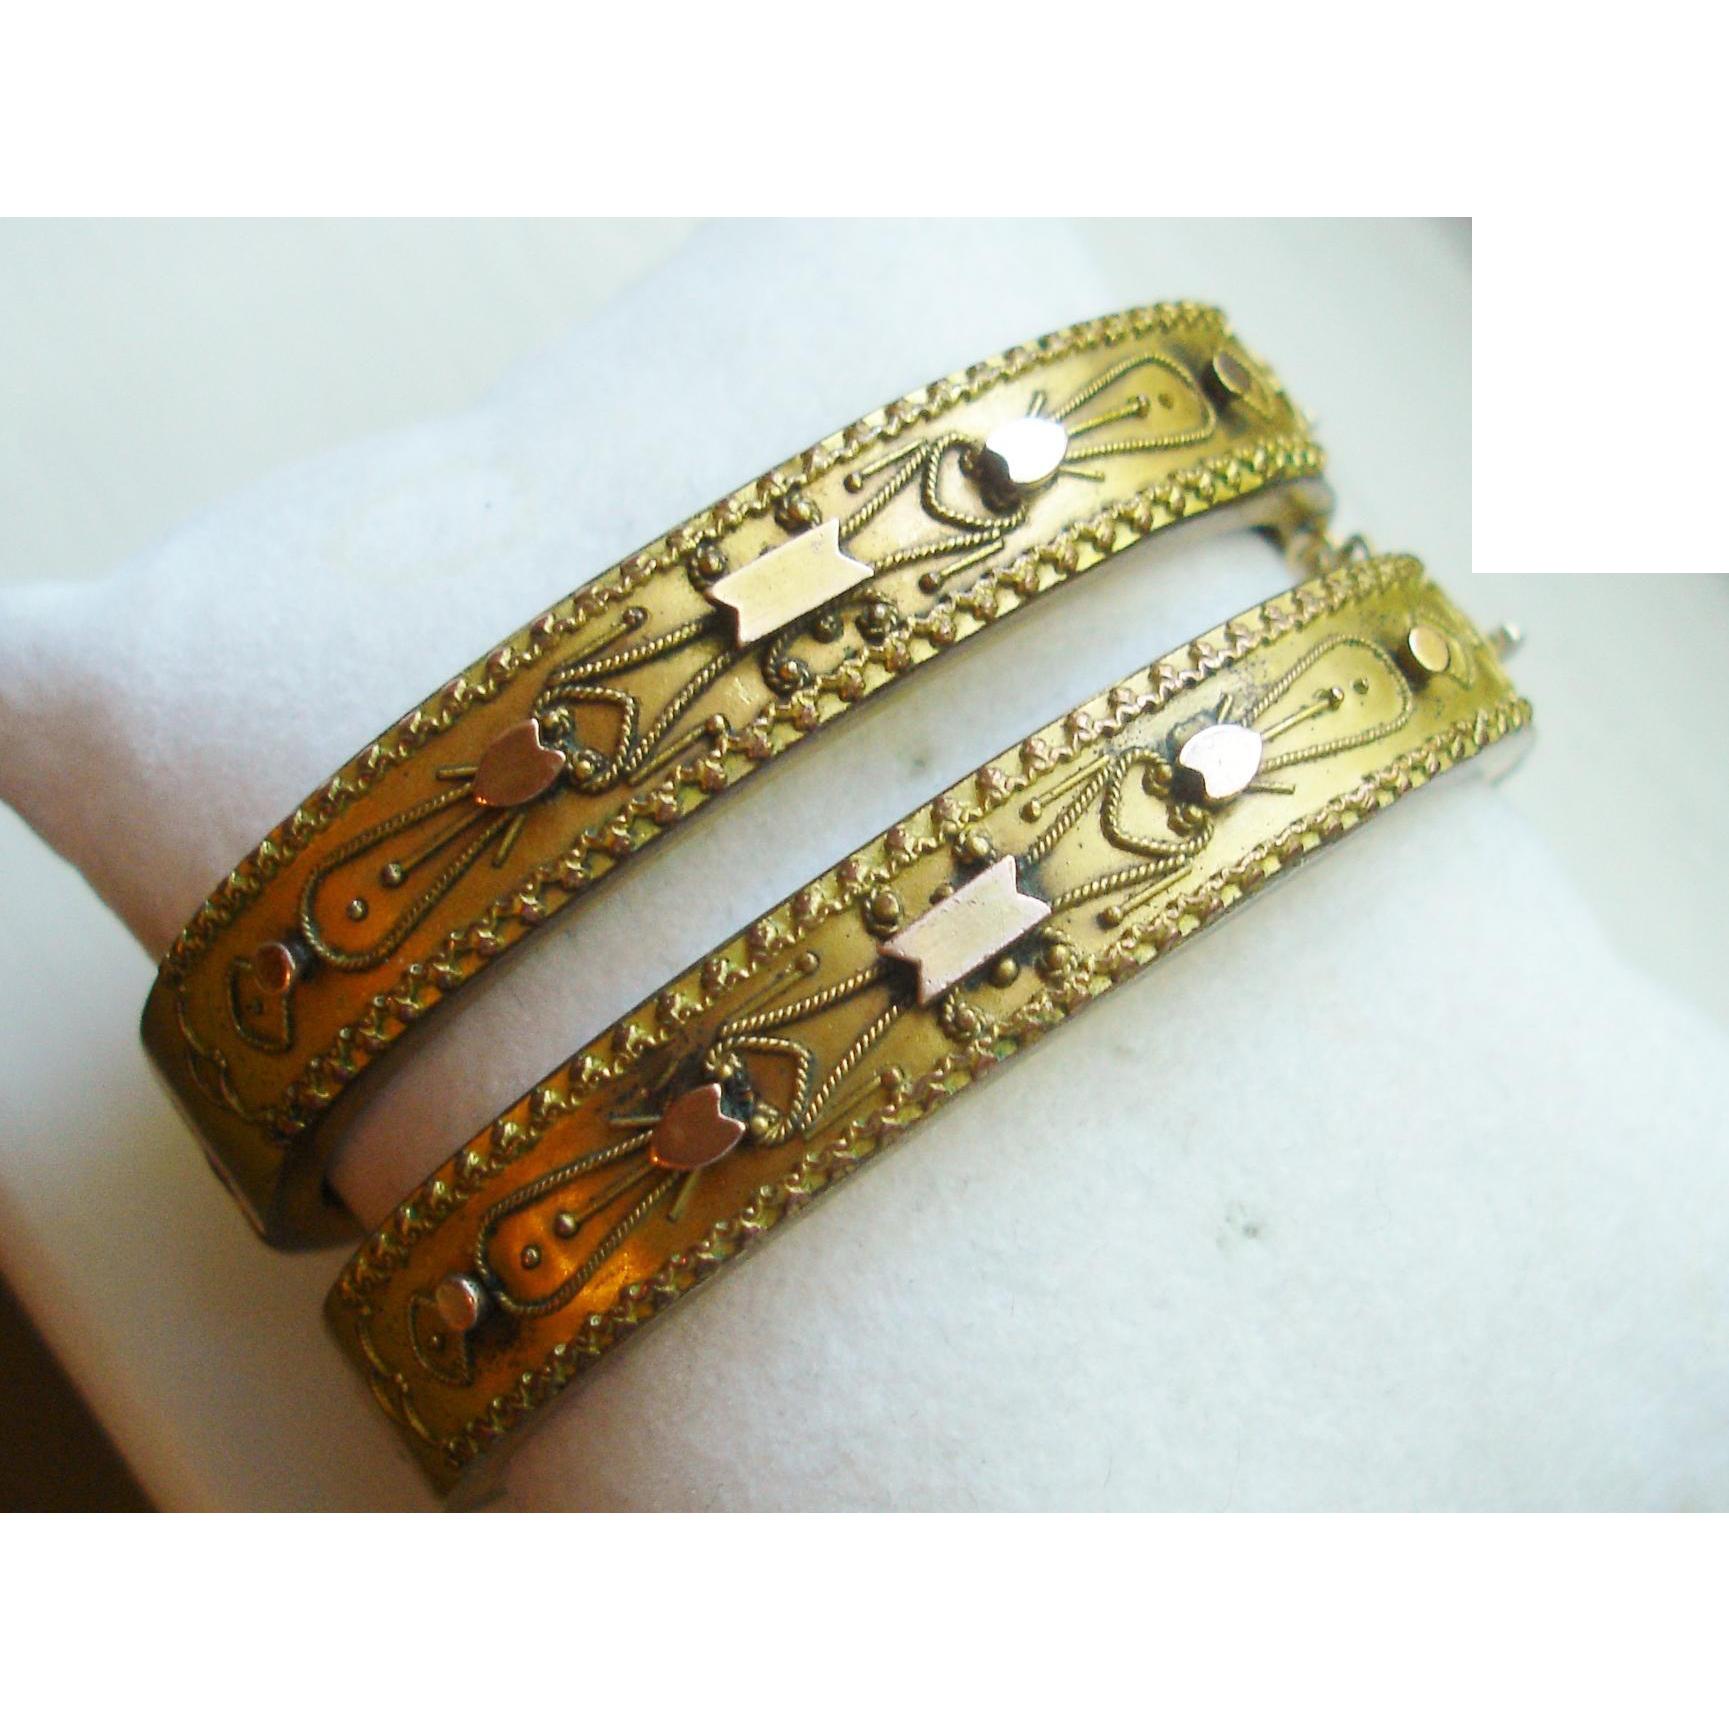 Antique Victorian Etruscan Wedding Bangle Bracelets, Matching Pair, circa 1875